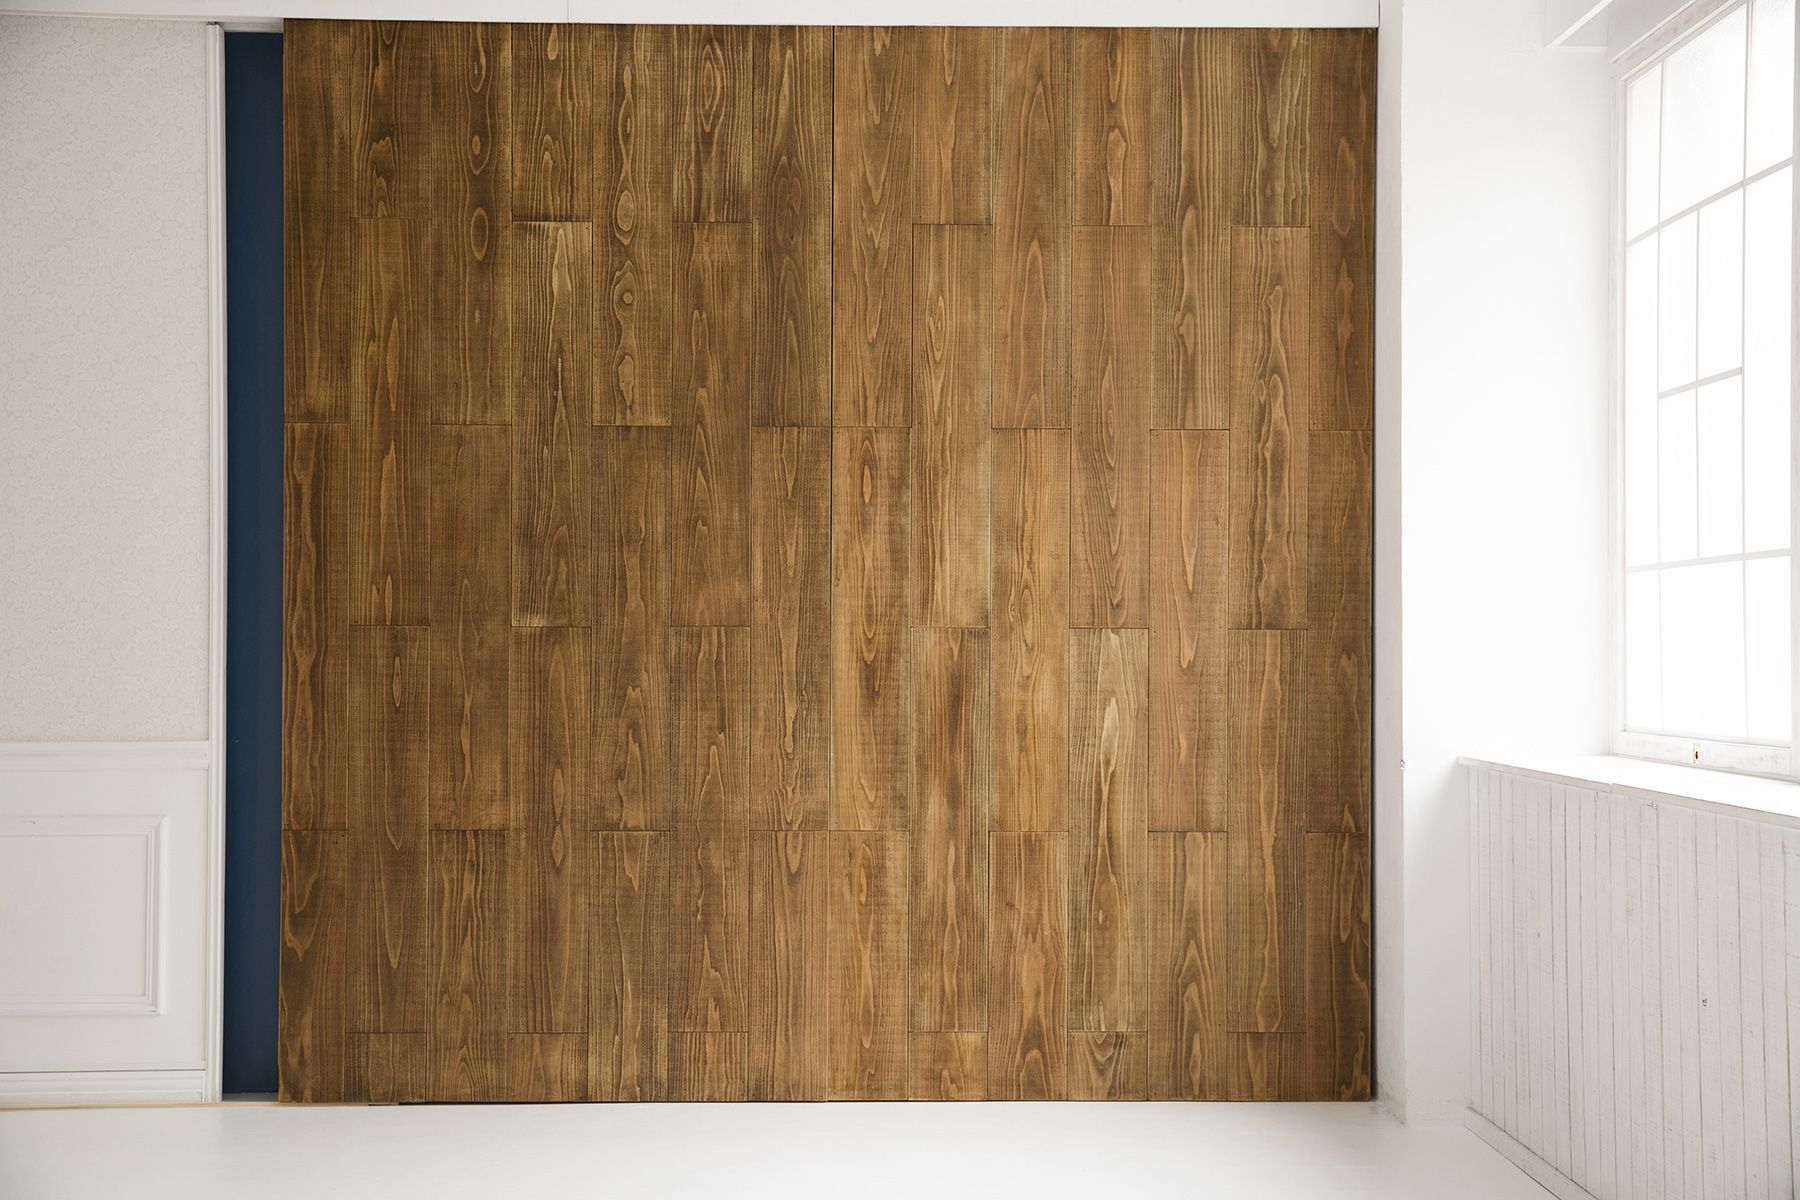 studio Mired(スタジオ ミレッド)パネル変更可能 木壁